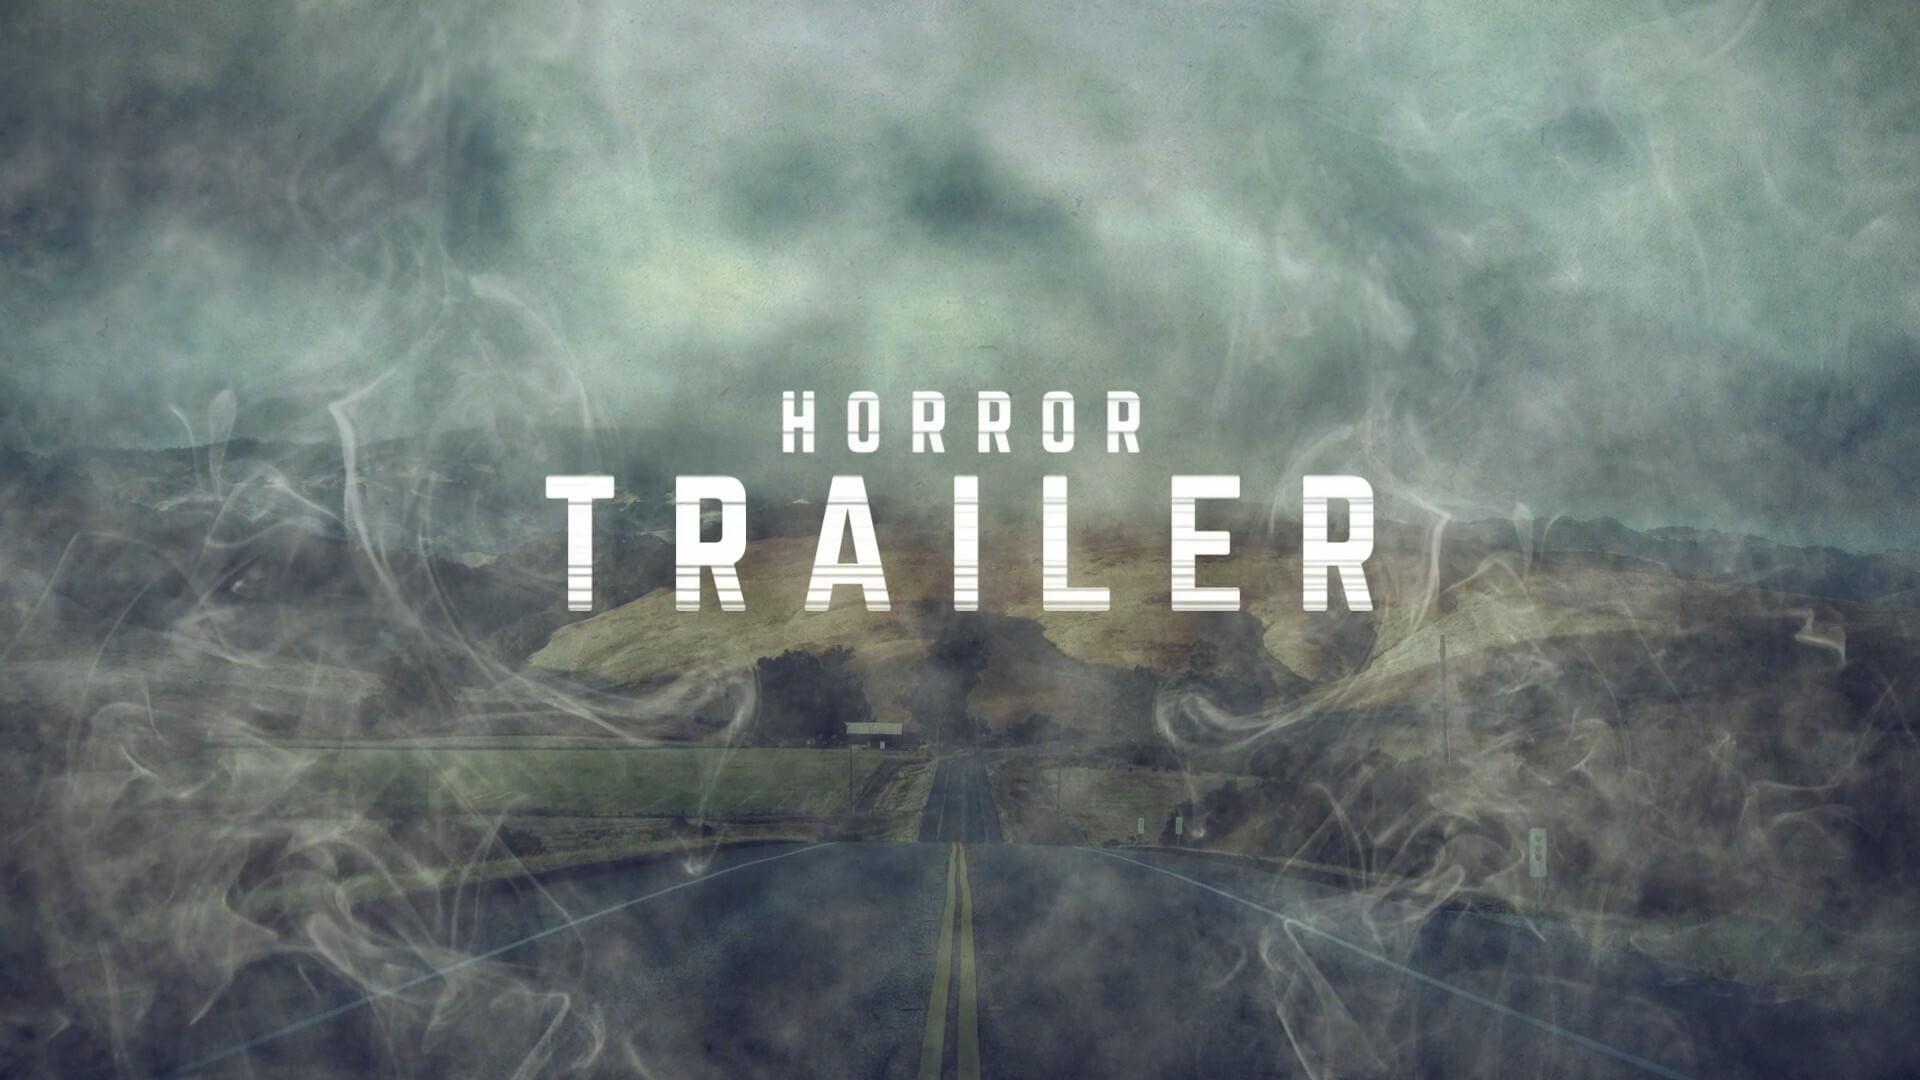 fcpx主题模板 震撼低沉大气电影预告片 Horror trailer titles